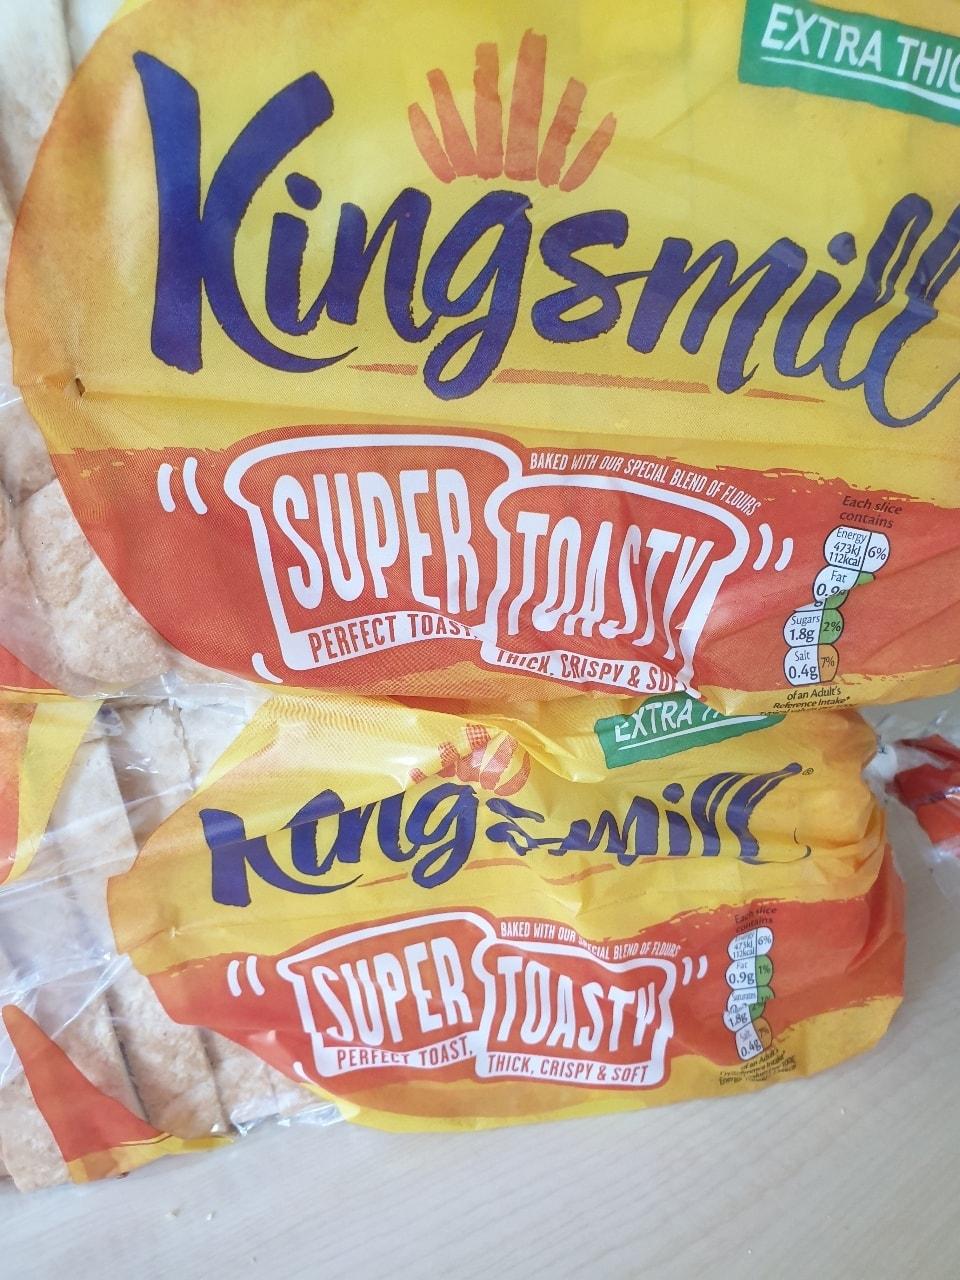 Super Toastie - Extra Thick